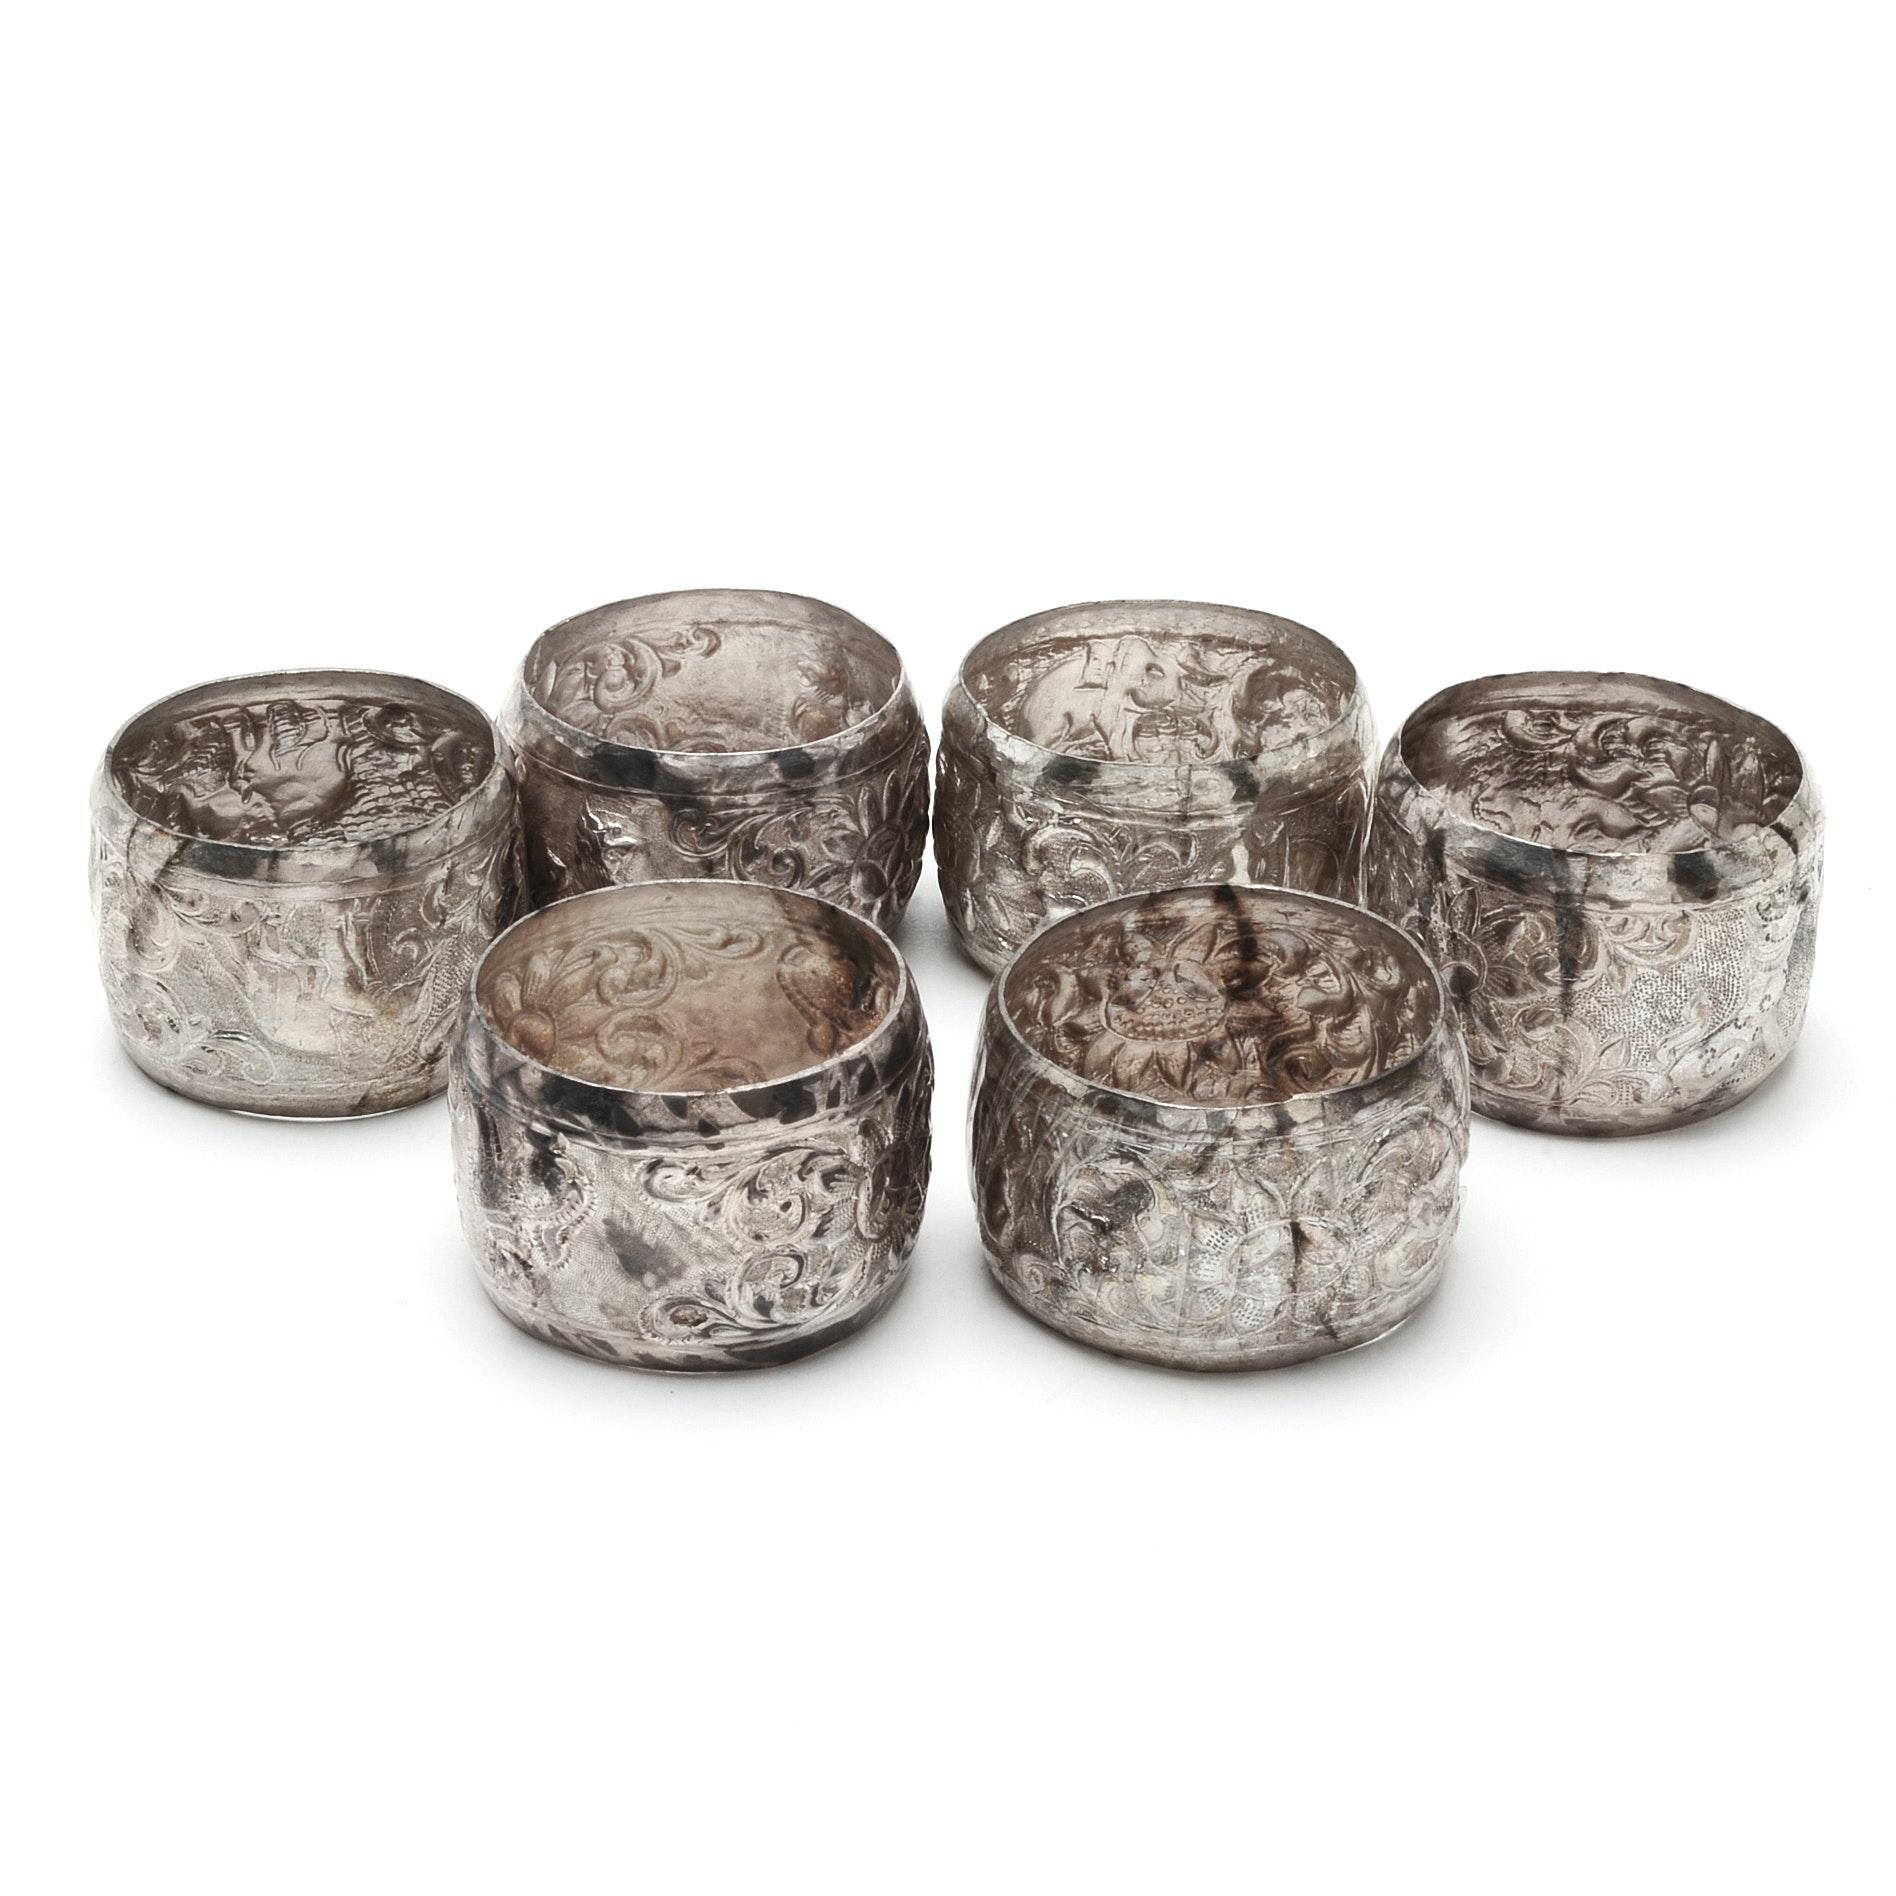 Sterling Silver Embossed Napkin Rings